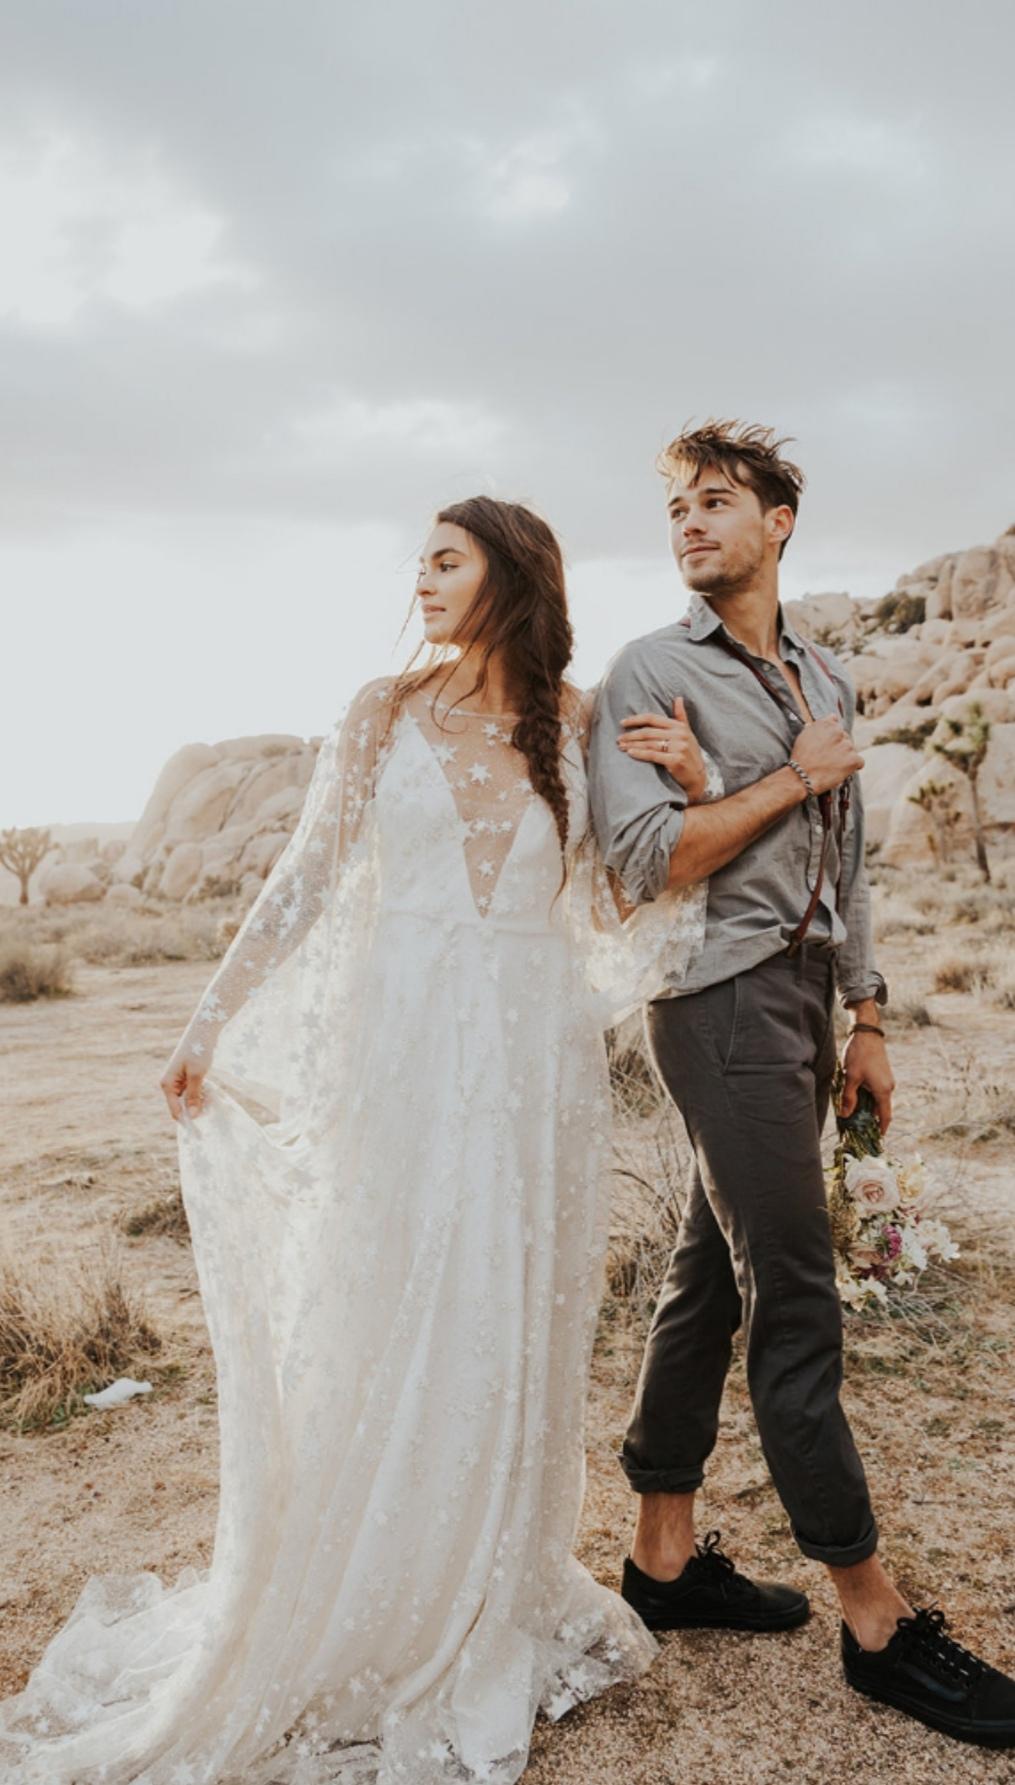 Star wedding dresses